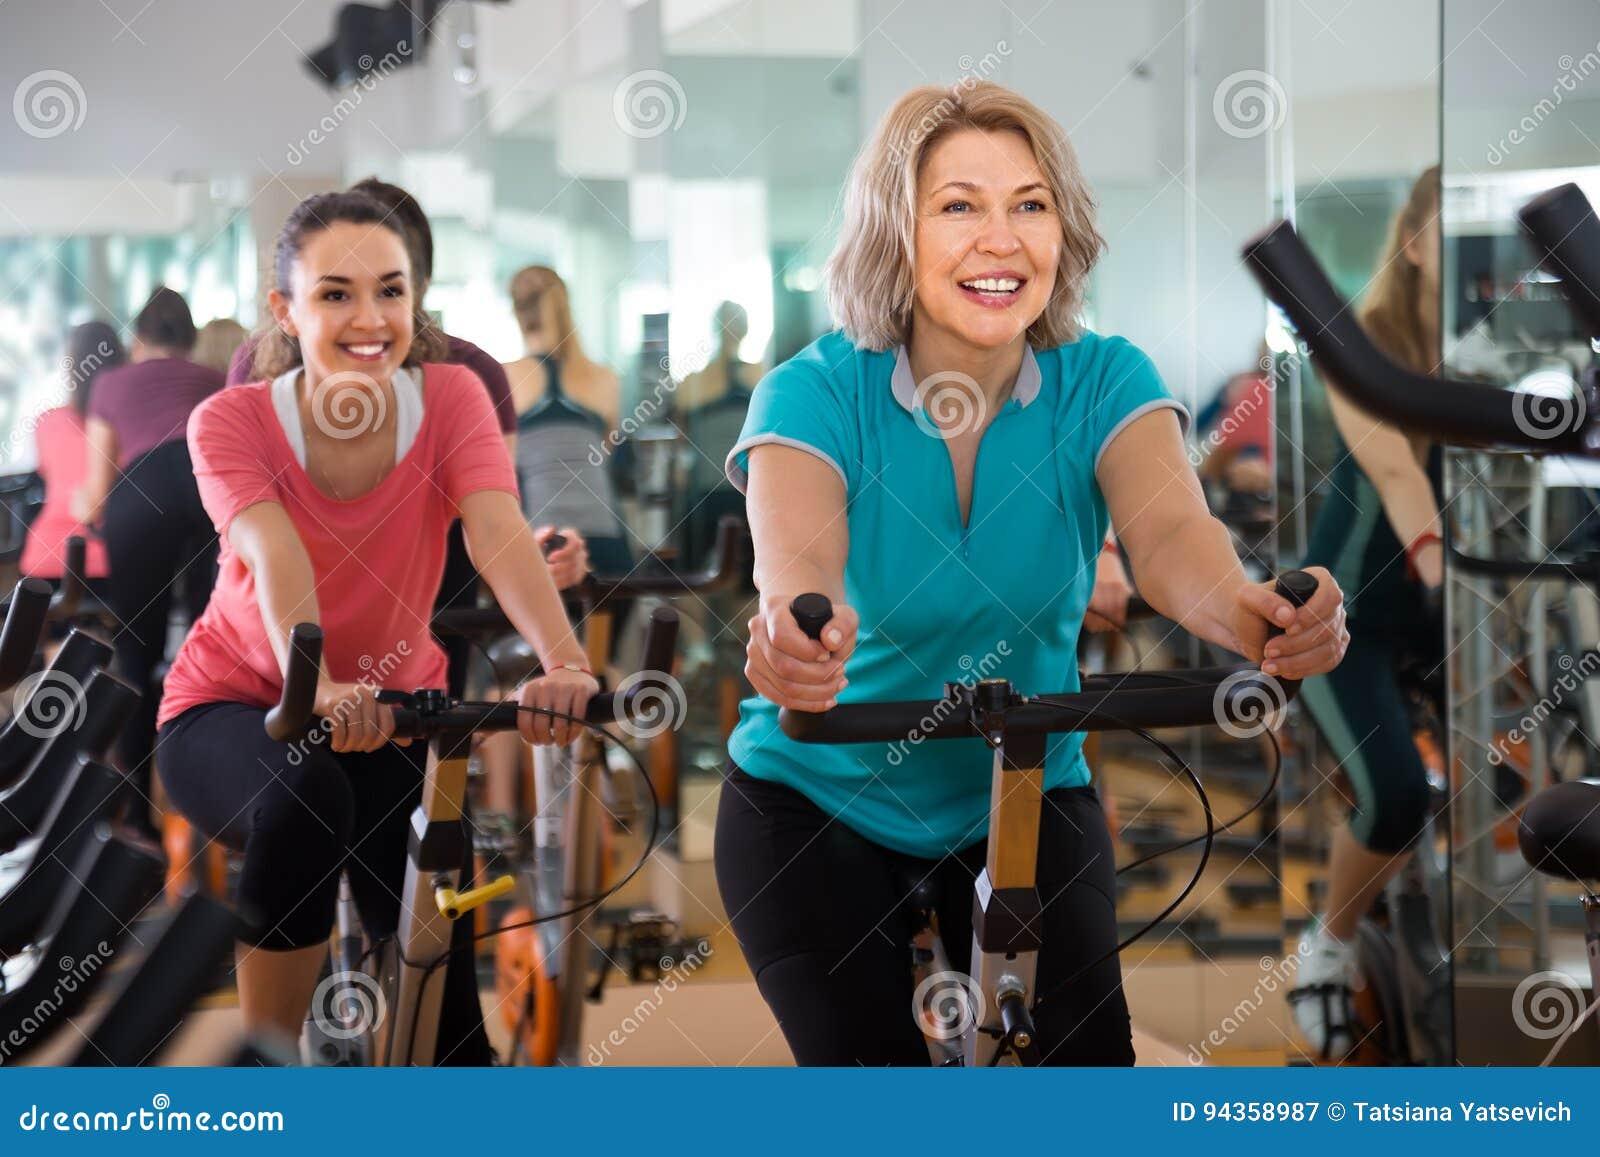 Vigorous Females Of Different Age Training On Exercise Bikes Stock